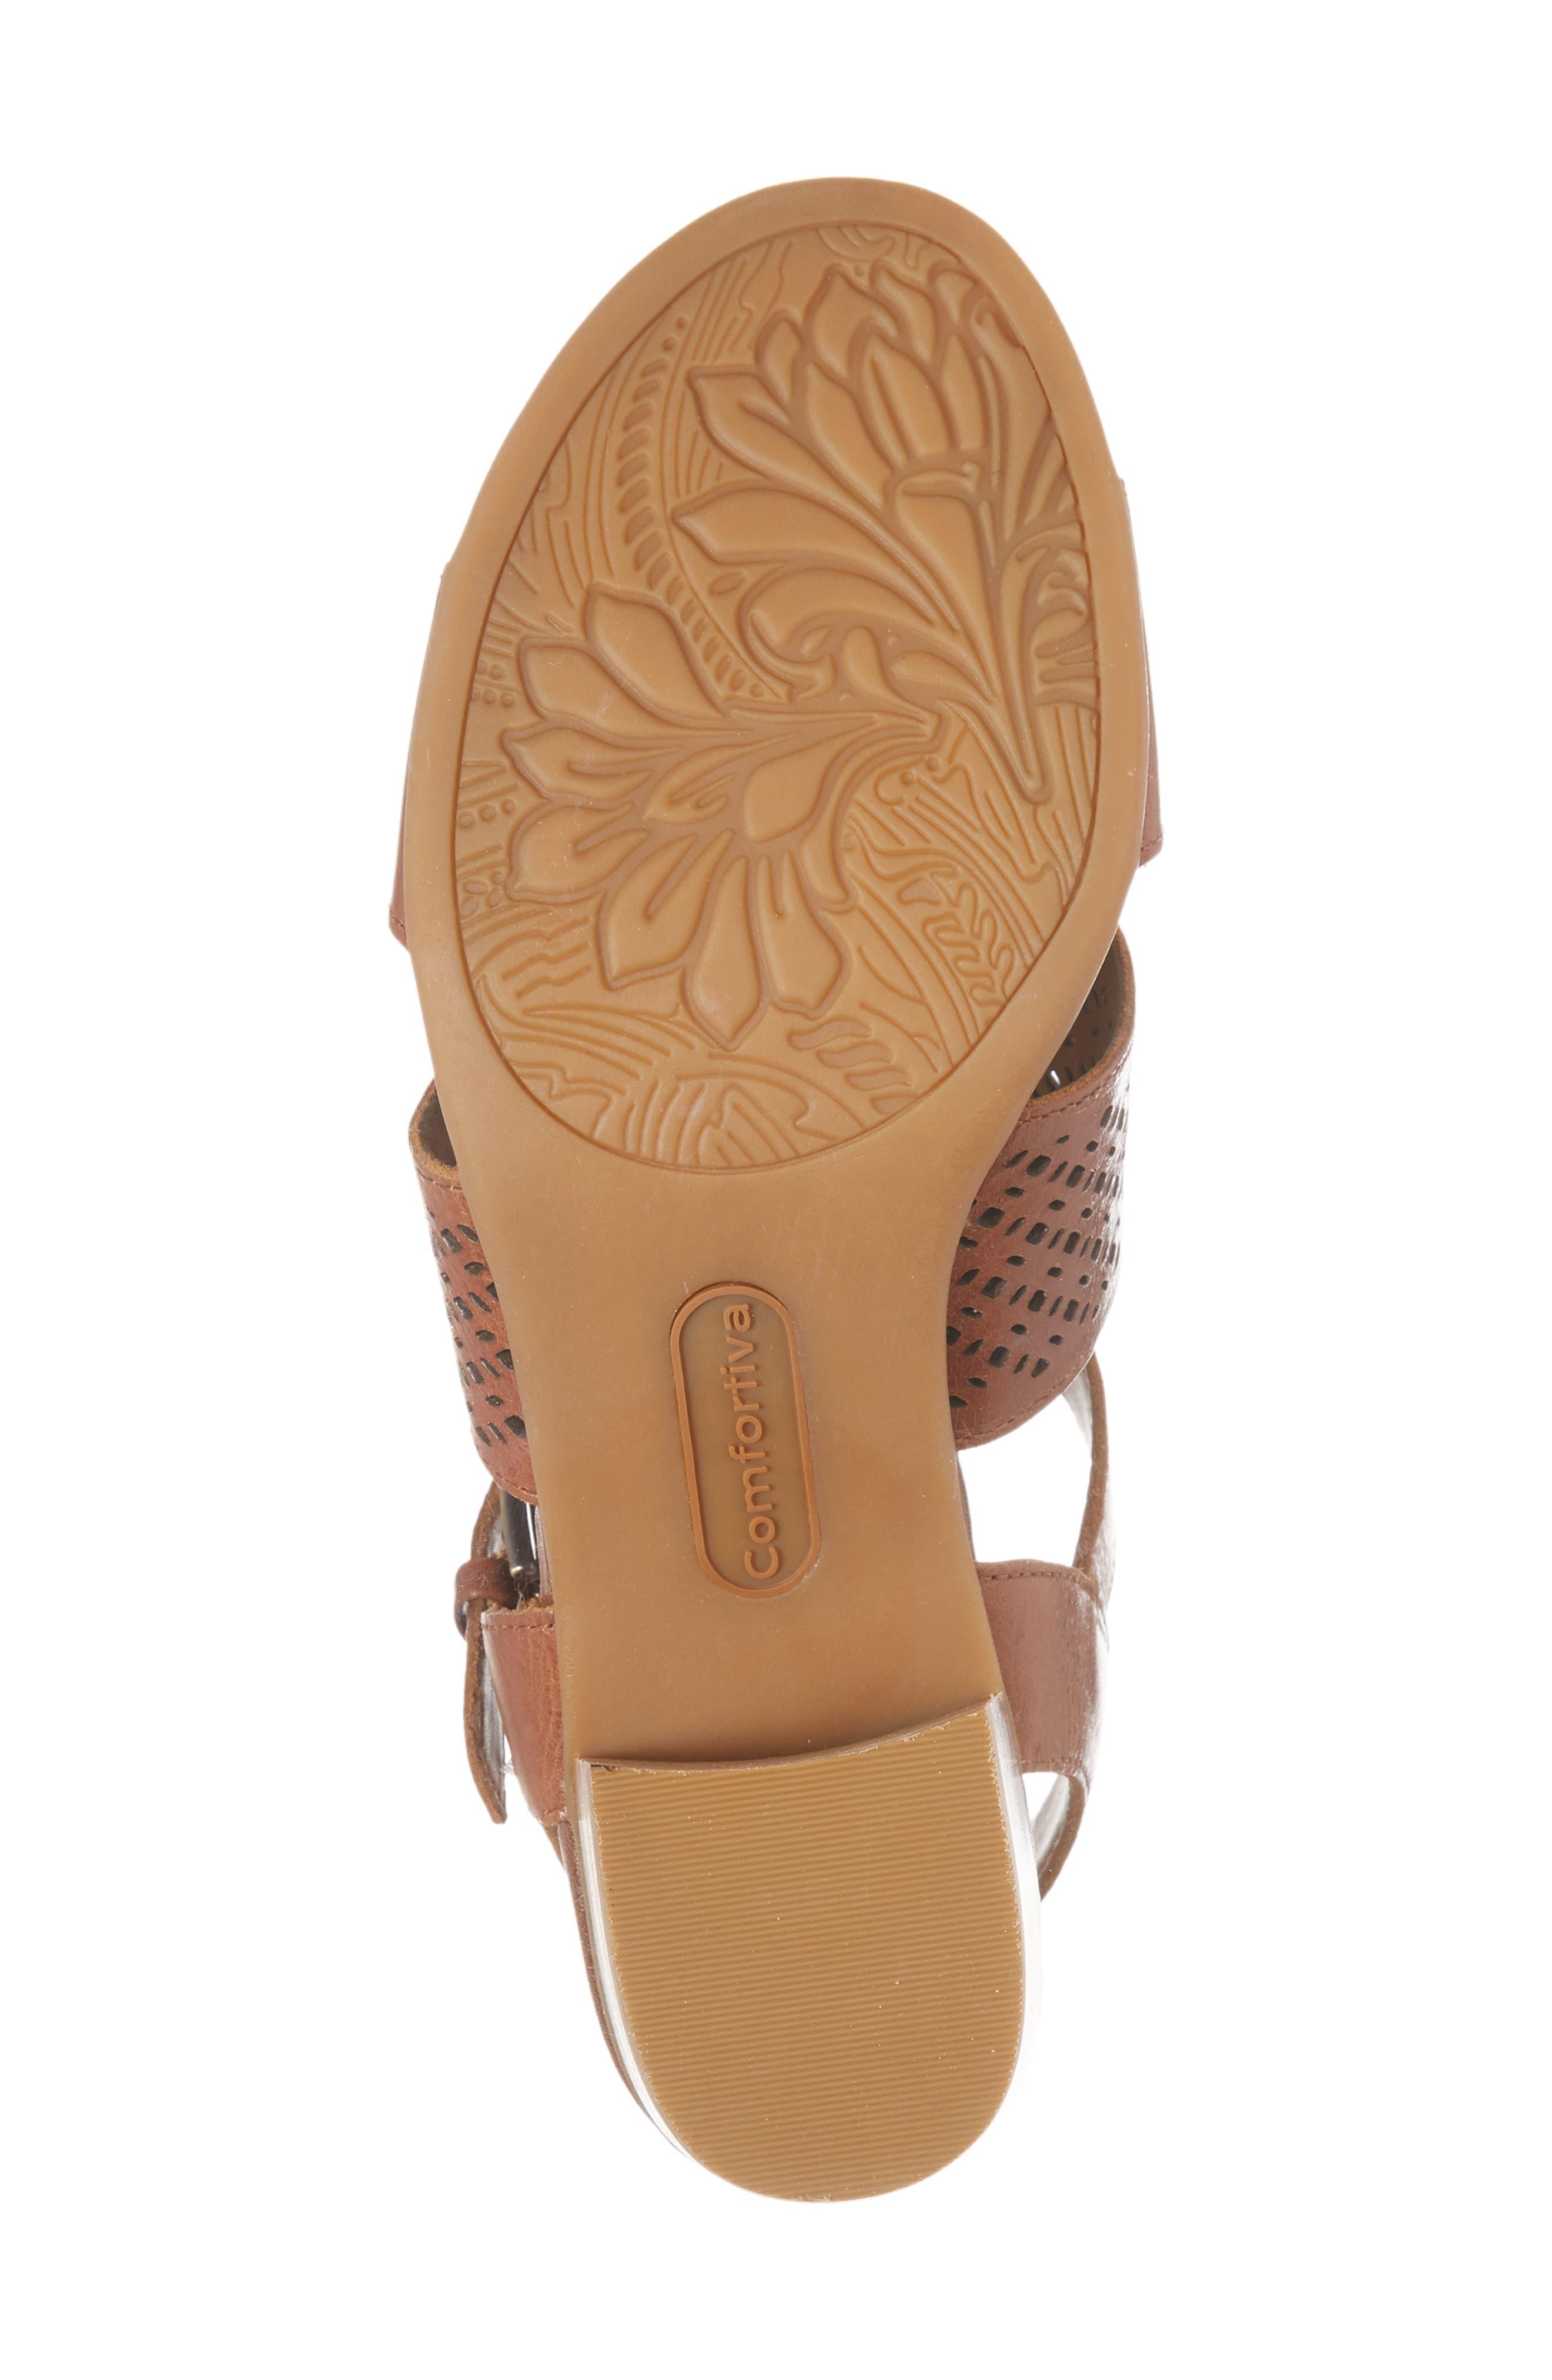 Amber Perforated Block Heel Sandal,                             Alternate thumbnail 6, color,                             Luggage Leather